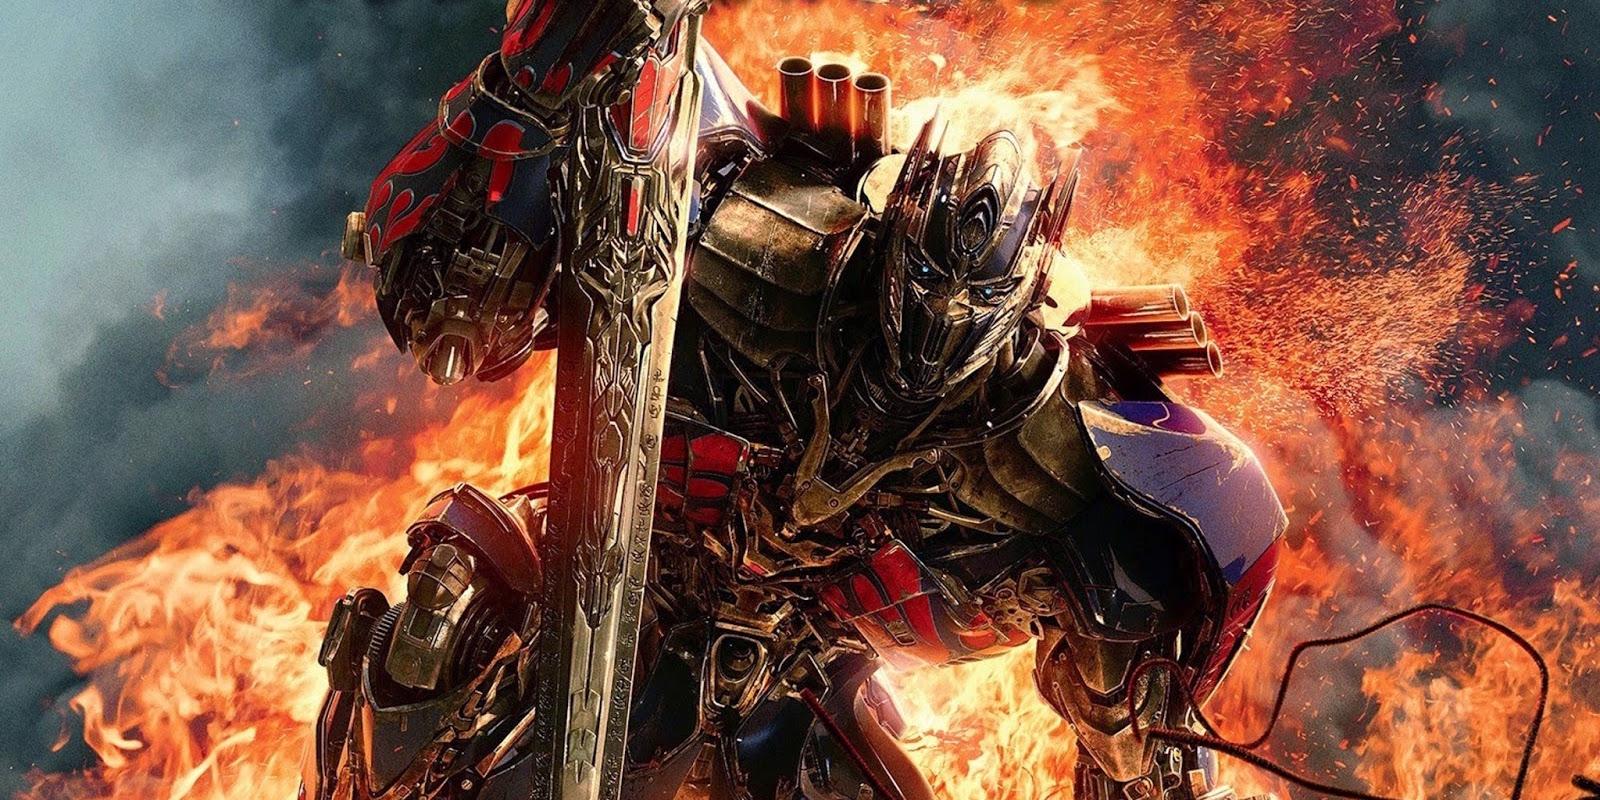 transformers 5 last knight score steve jablonsky